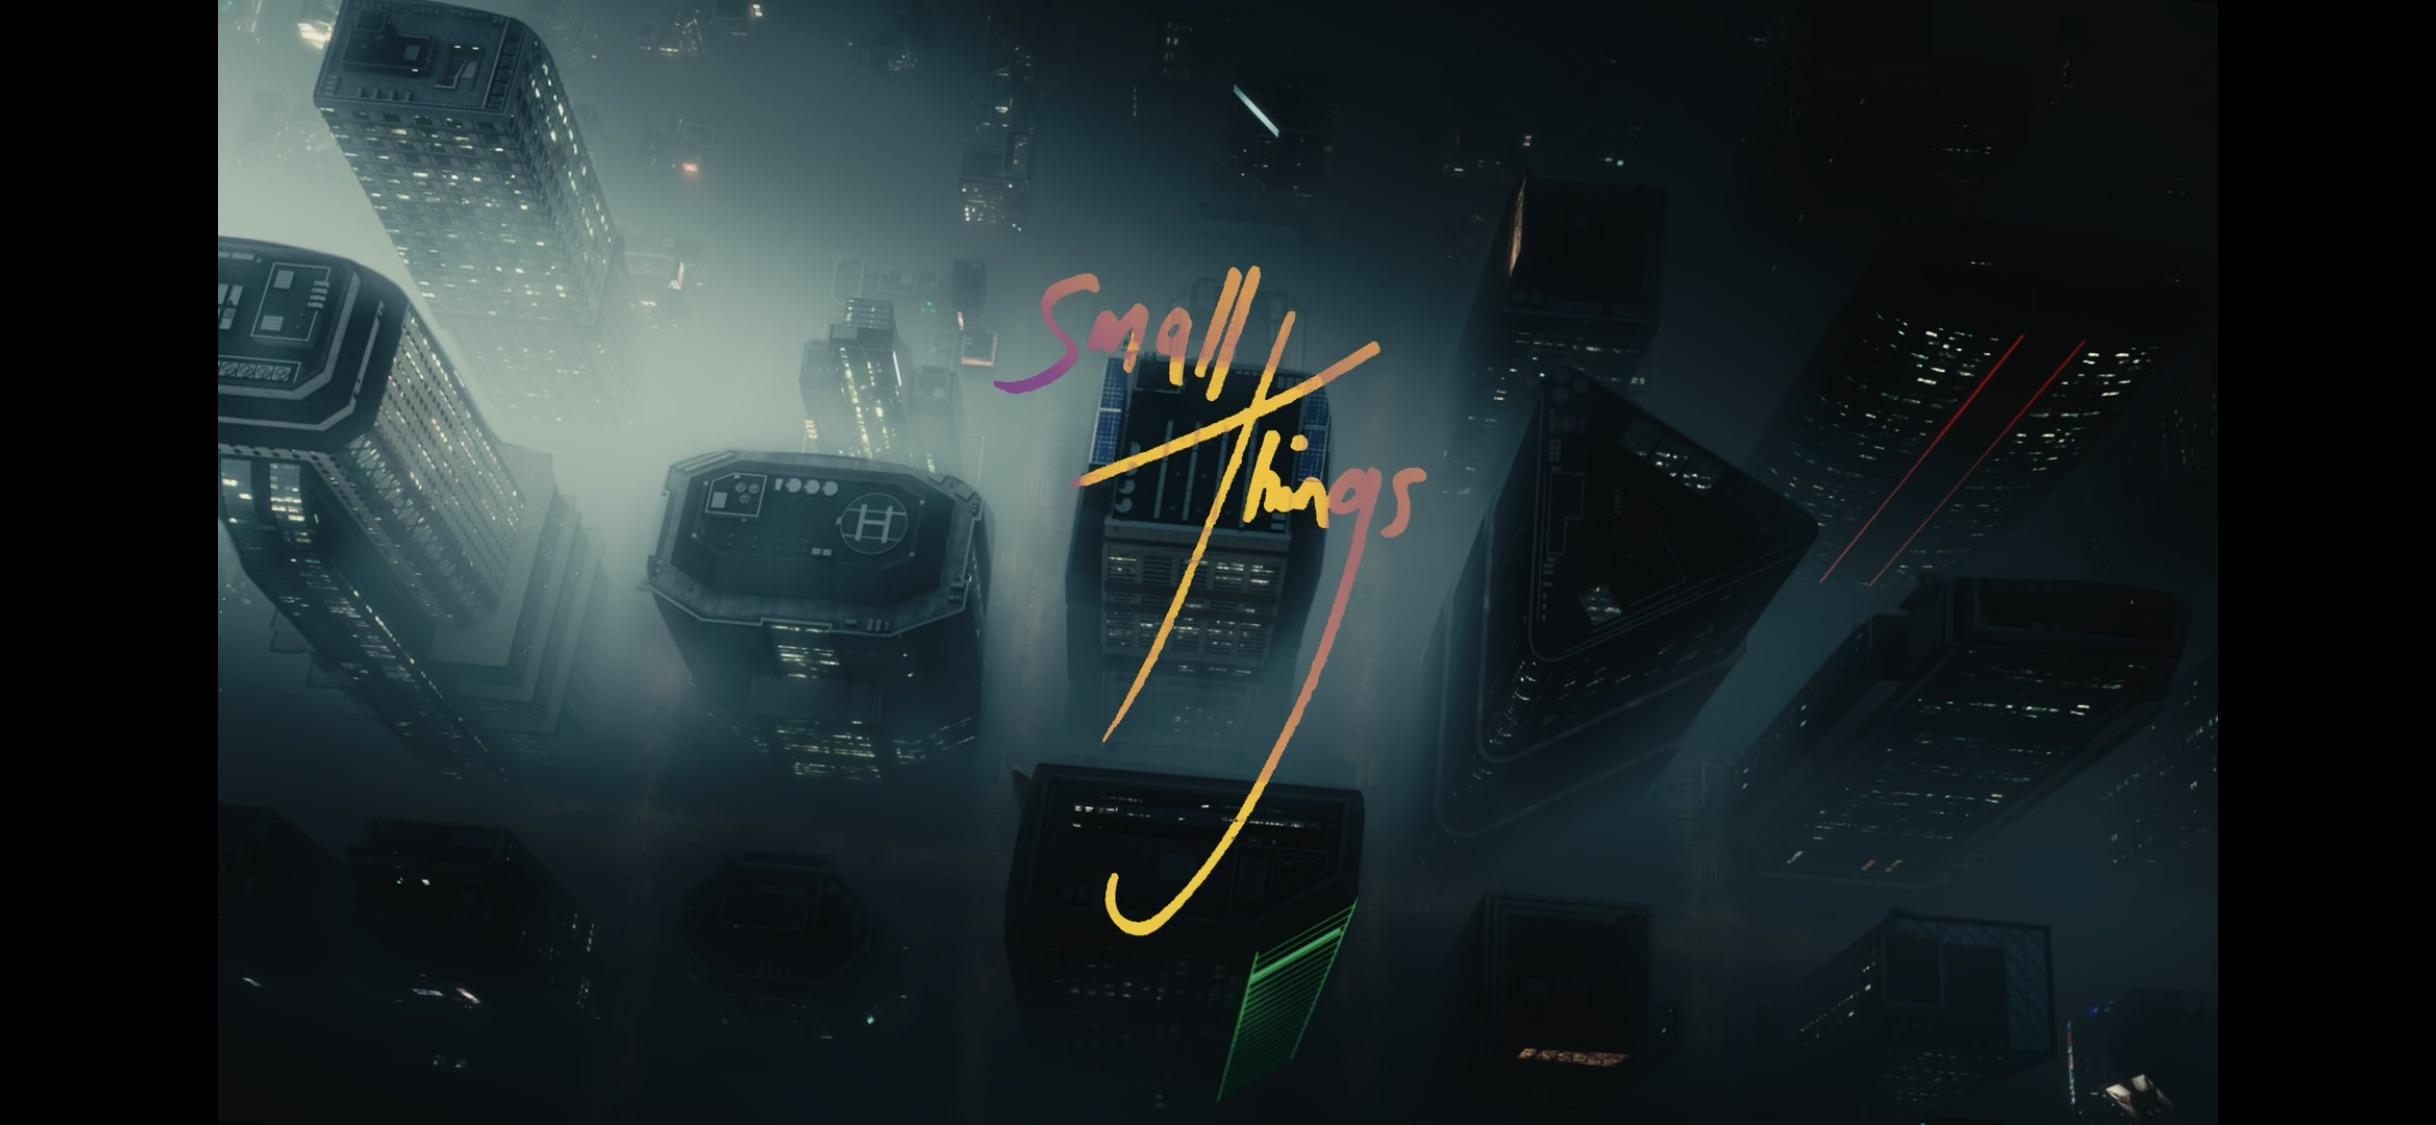 JOJO Santiago Salviche Small things-3